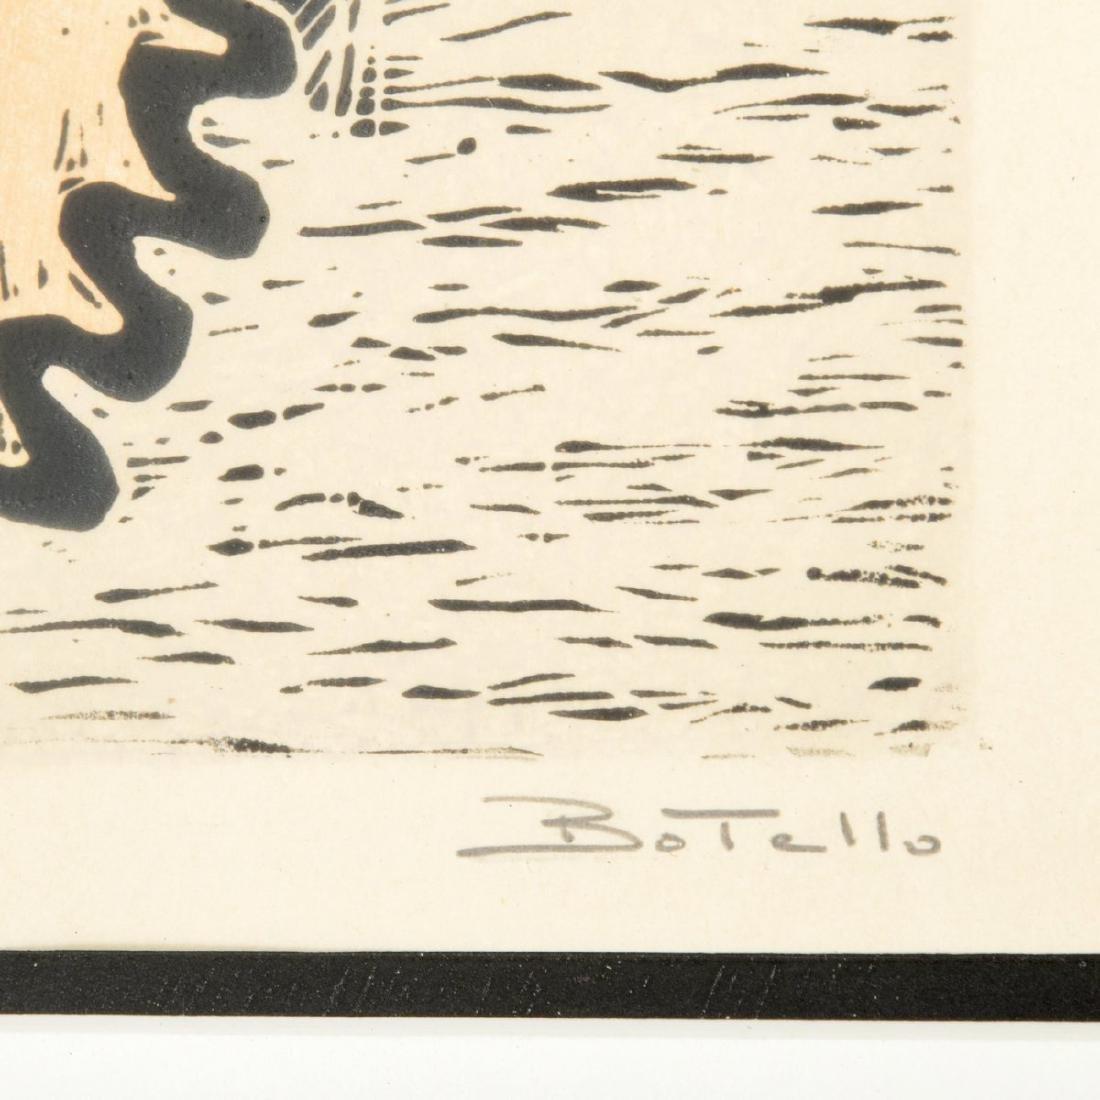 Angel Botello Woodcut Print, Signed Edition - 4